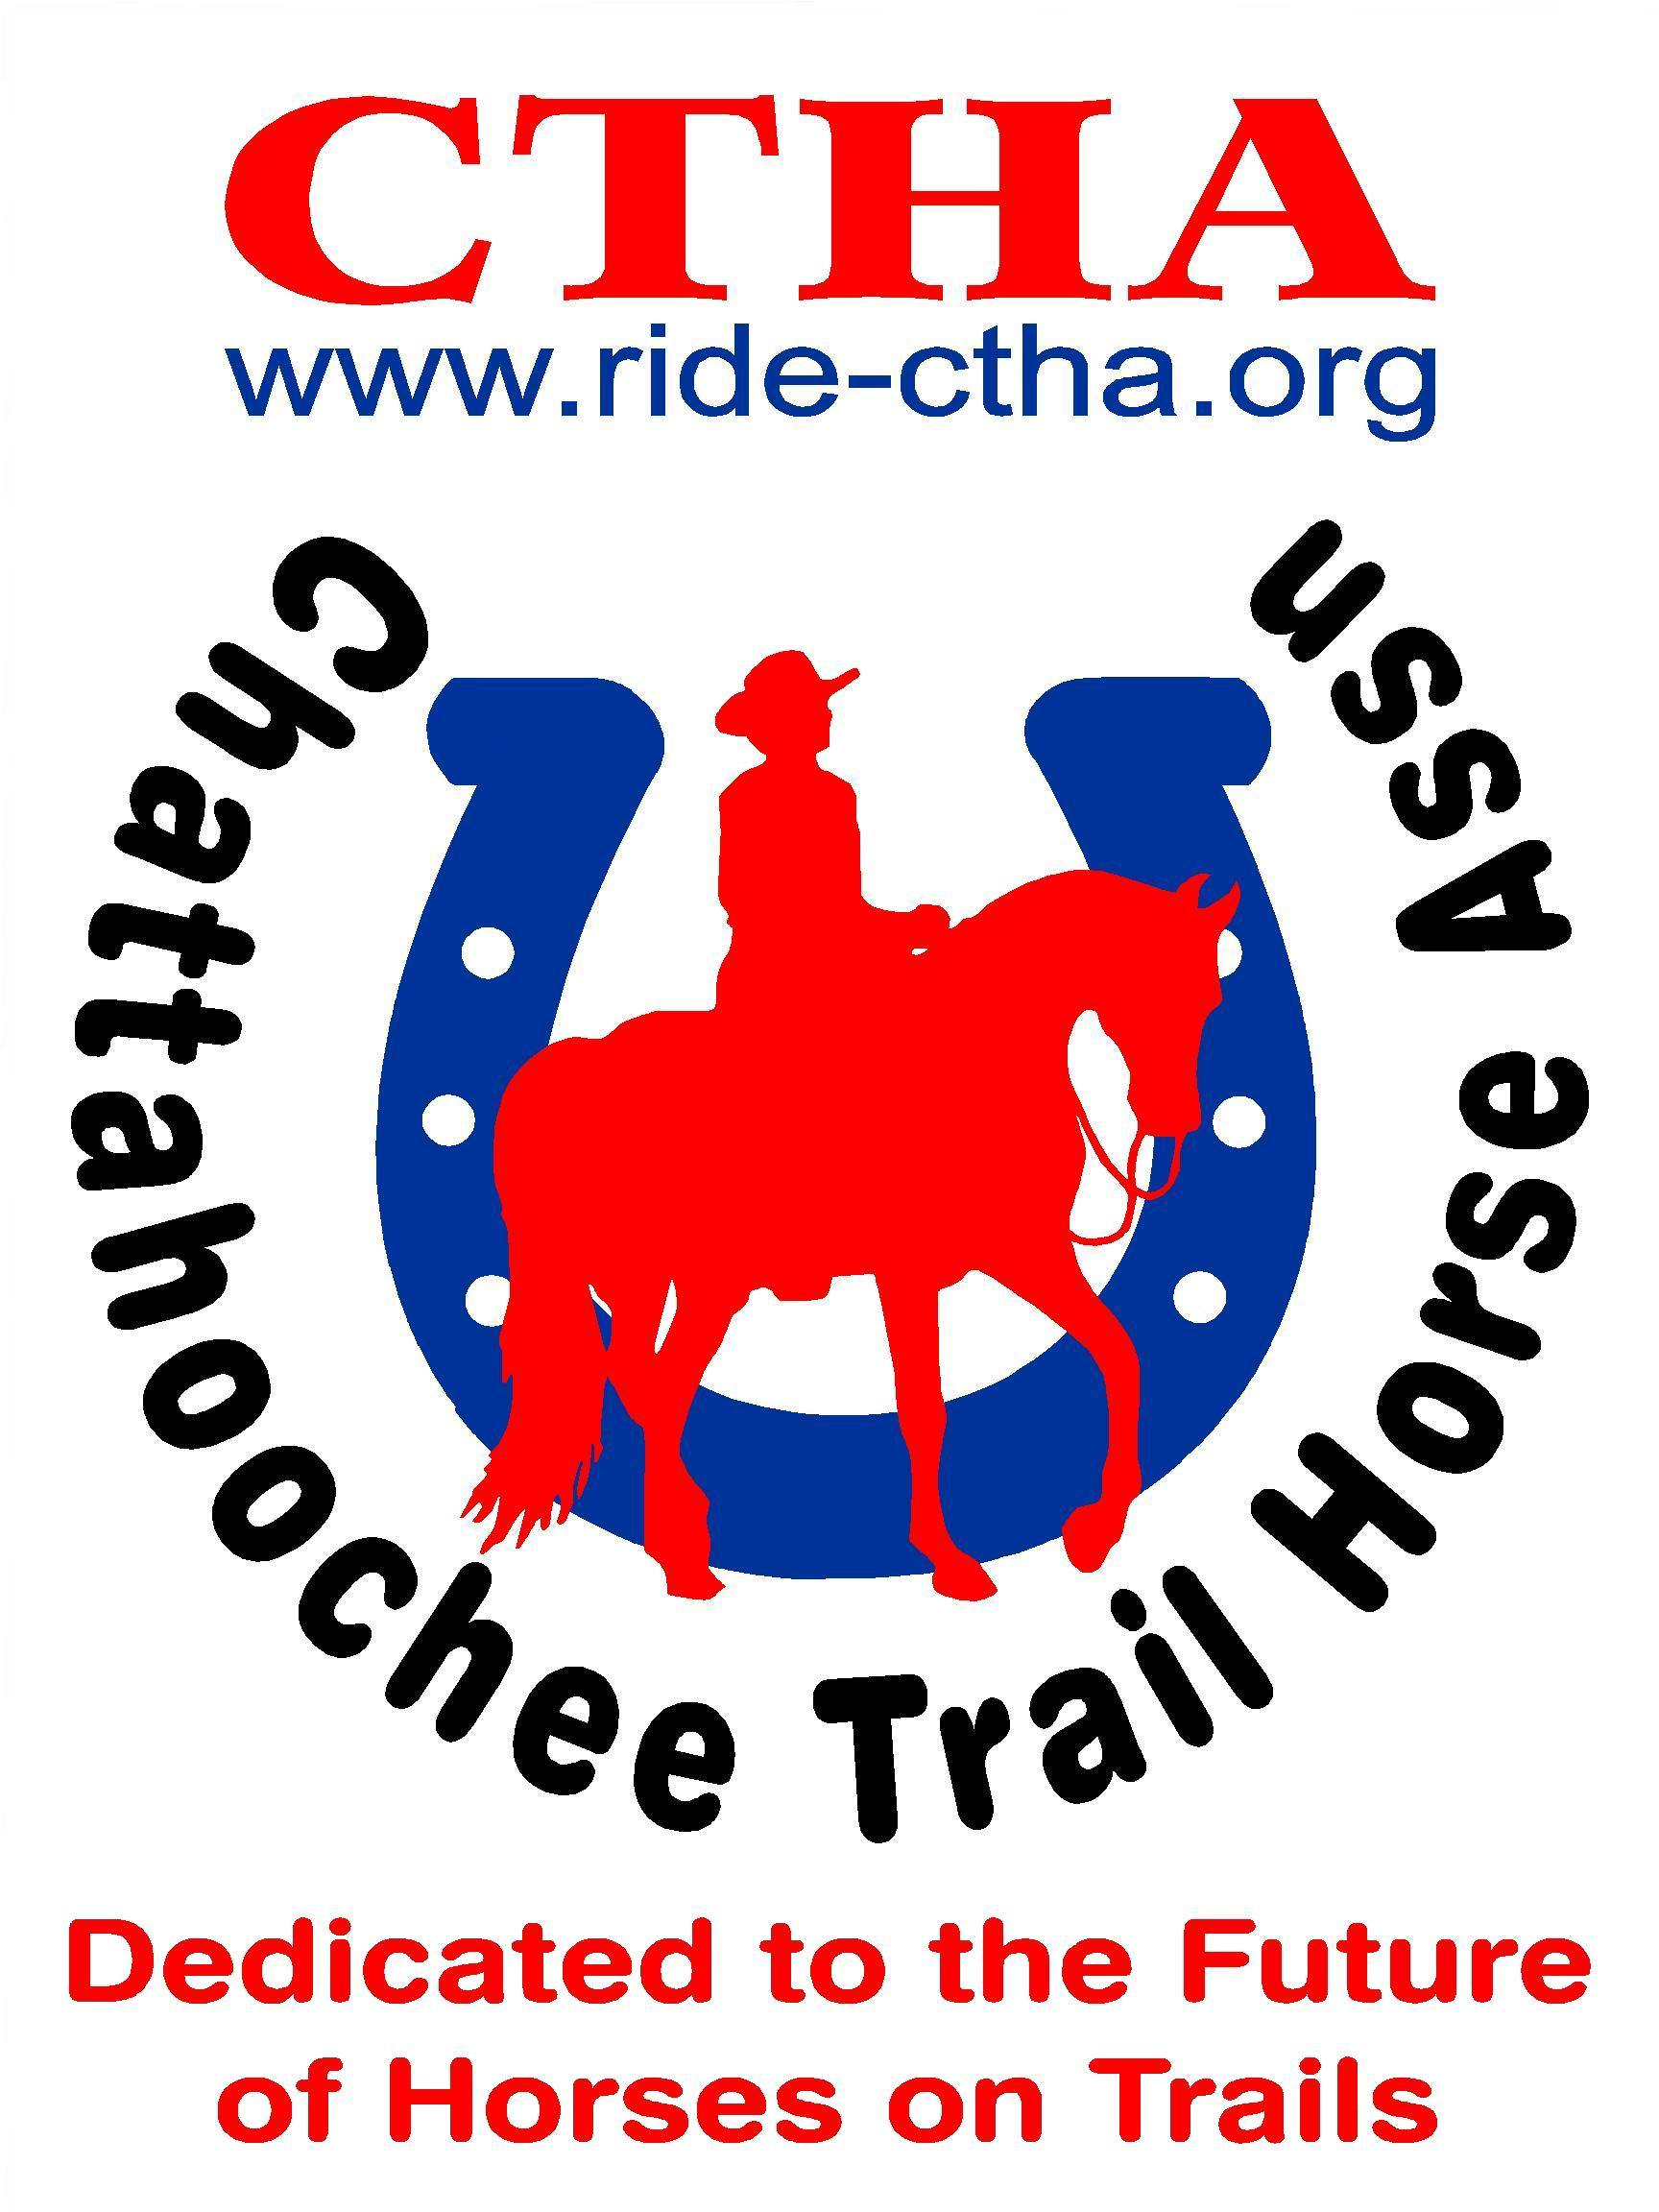 Chattahoochee Trail Horse Association